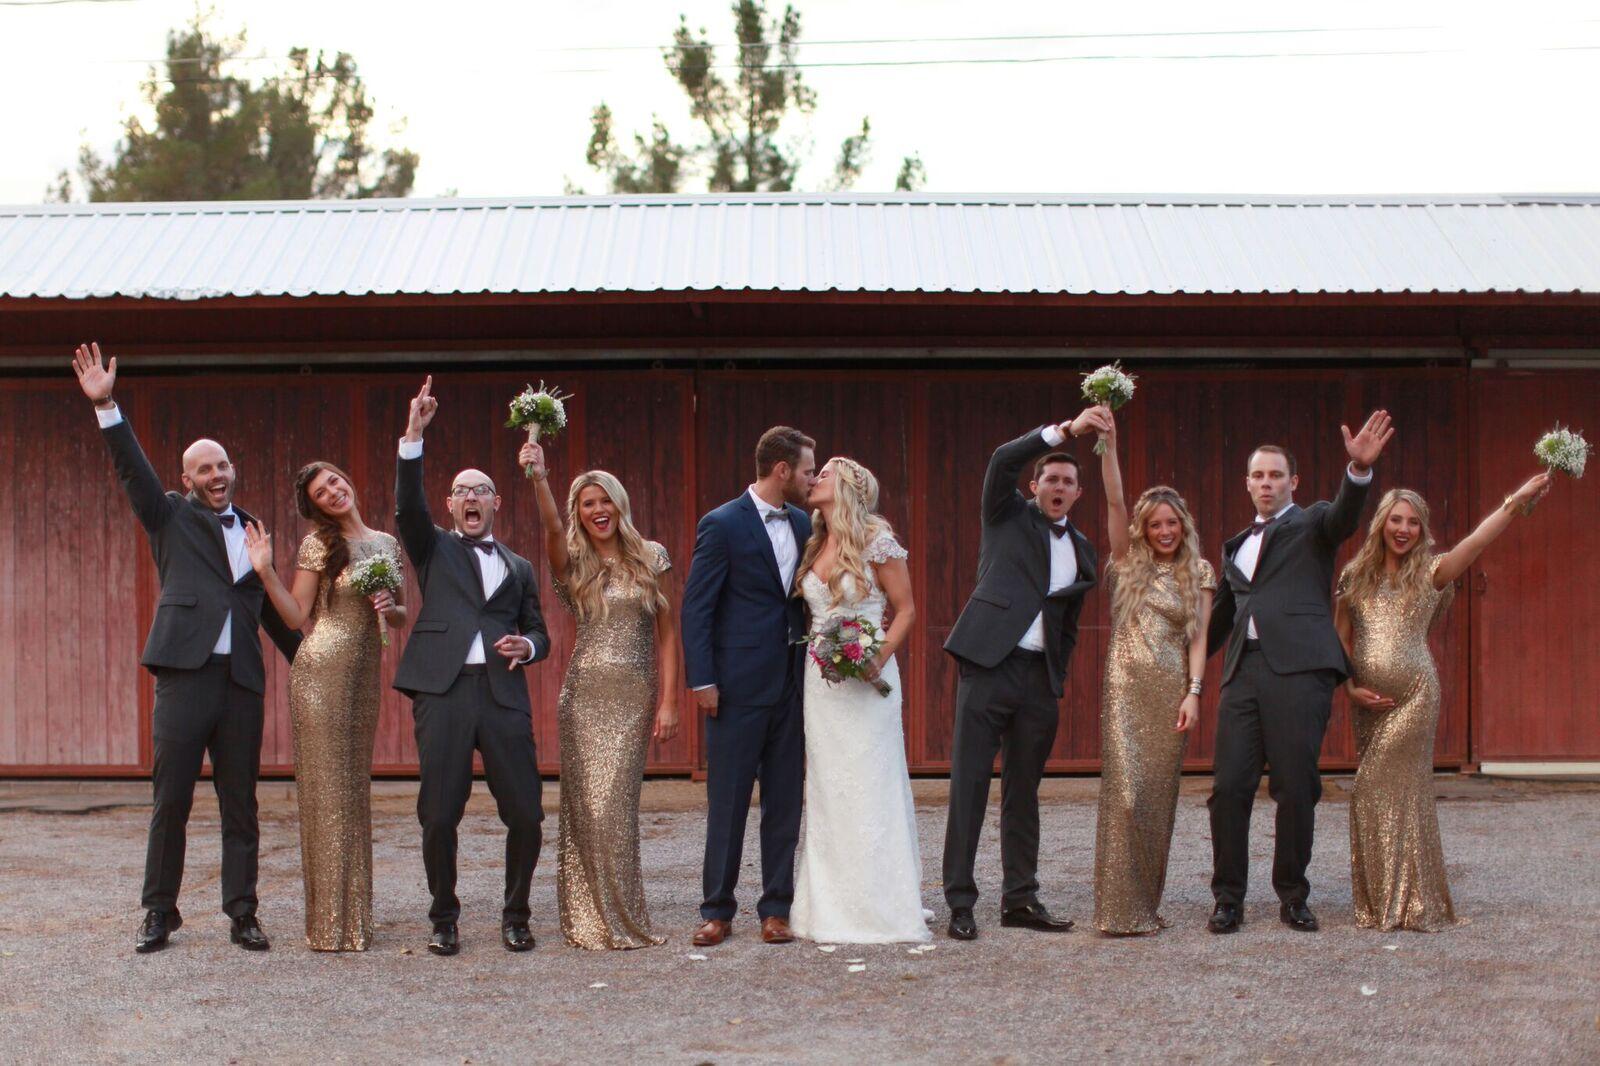 bride, groom, bridesmaids, and groomsmen photos on the wedding day.